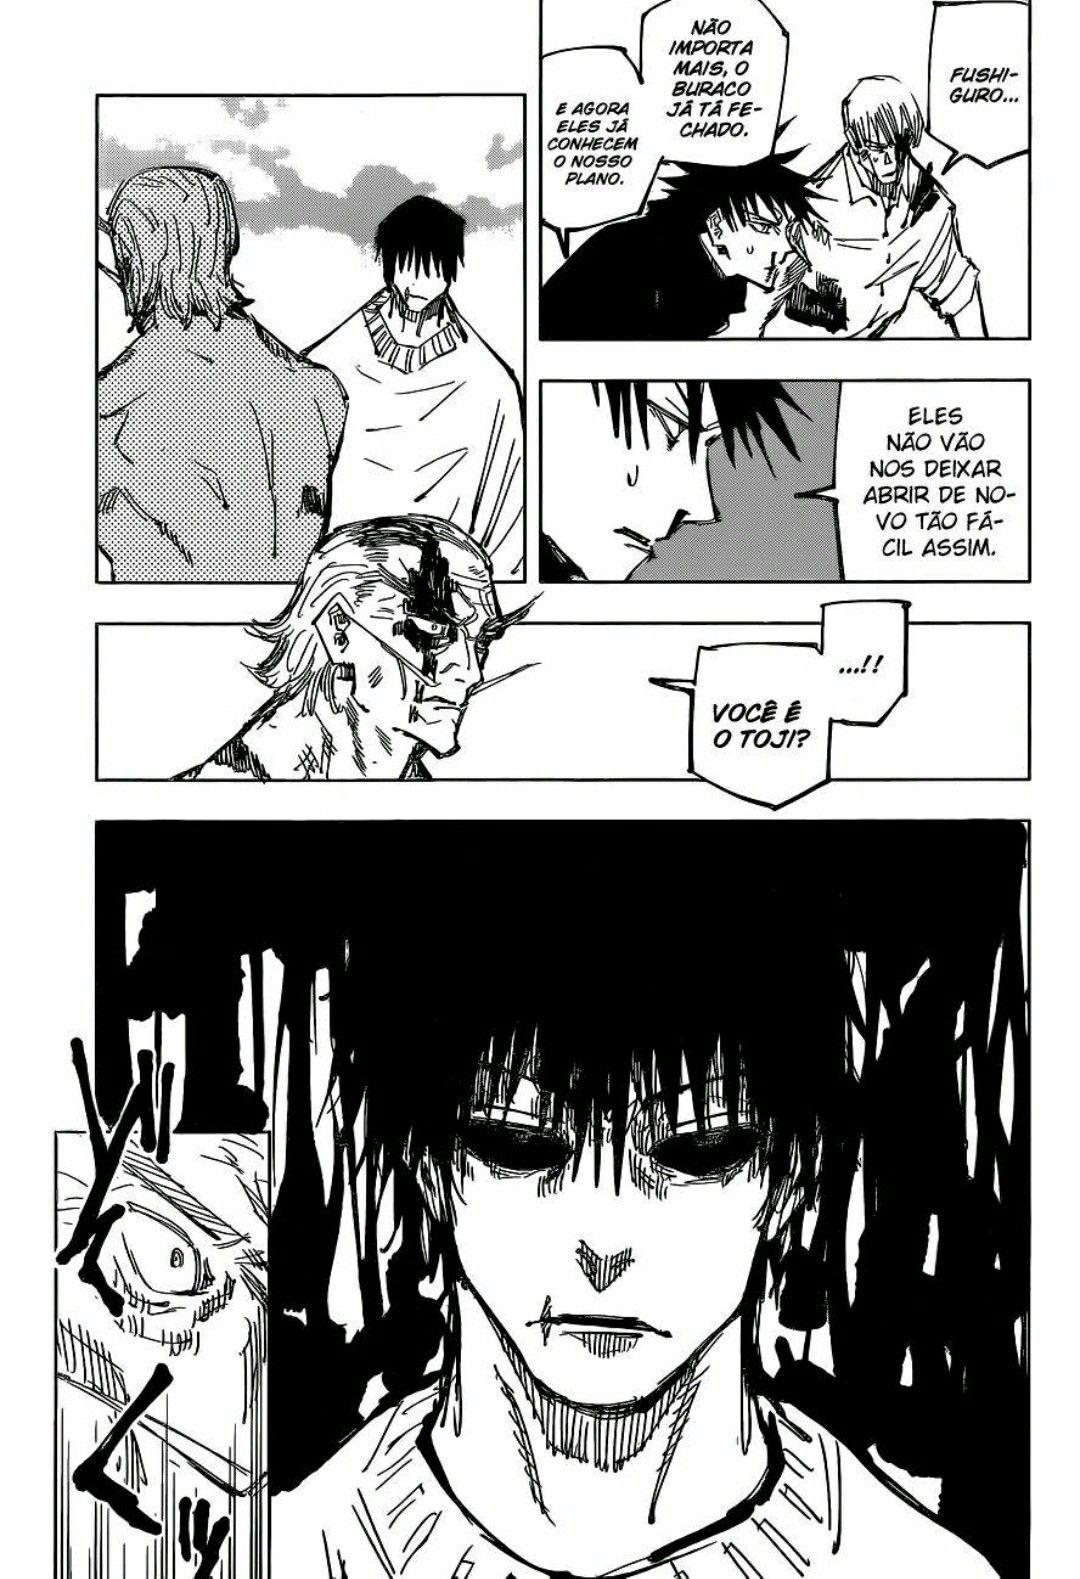 Screenshots Juju Arco Incidente Em Shibuya Jujutsu Bleach Anime Manga Online Read